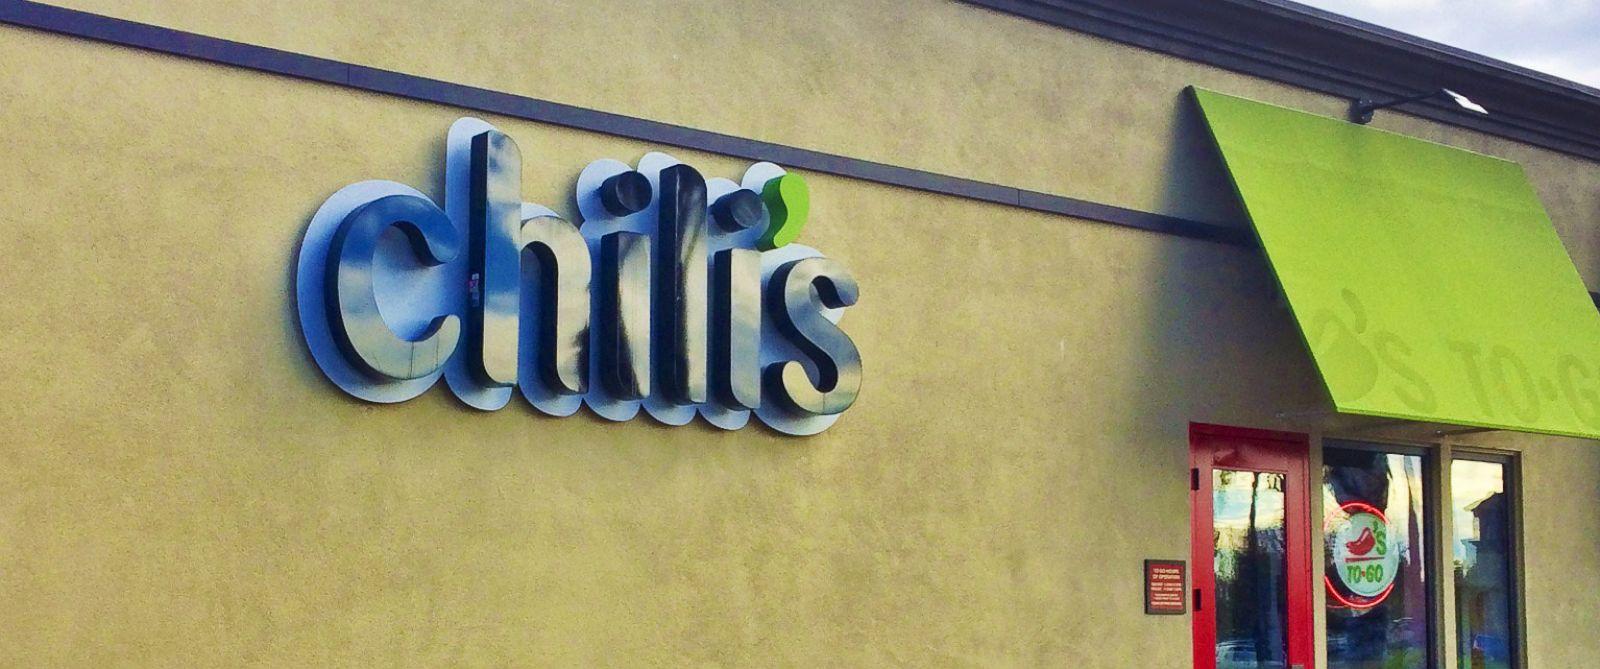 PHOTO: Chilis storefront sign.